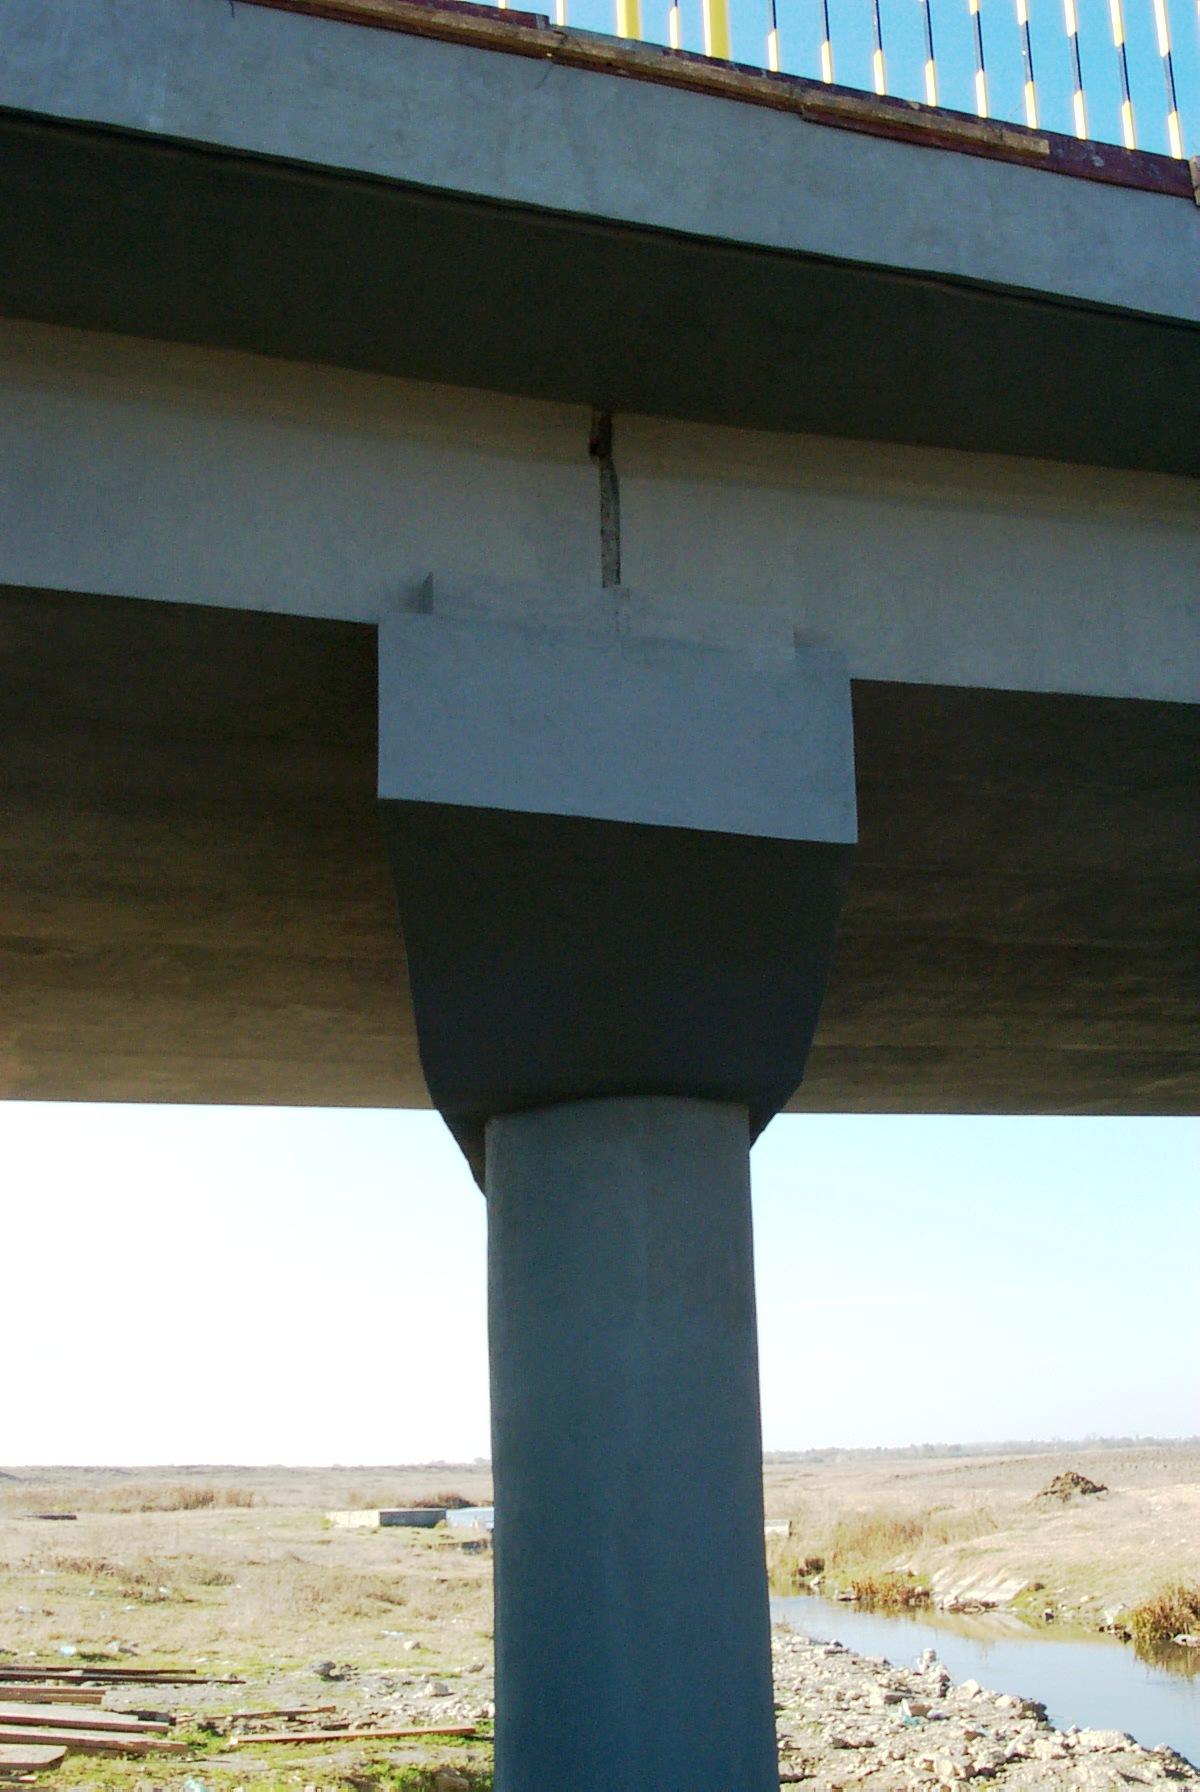 Reparatii pod (DN2), Km. 33 - 028, peste raul Calnistea MAPEI - Poza 21